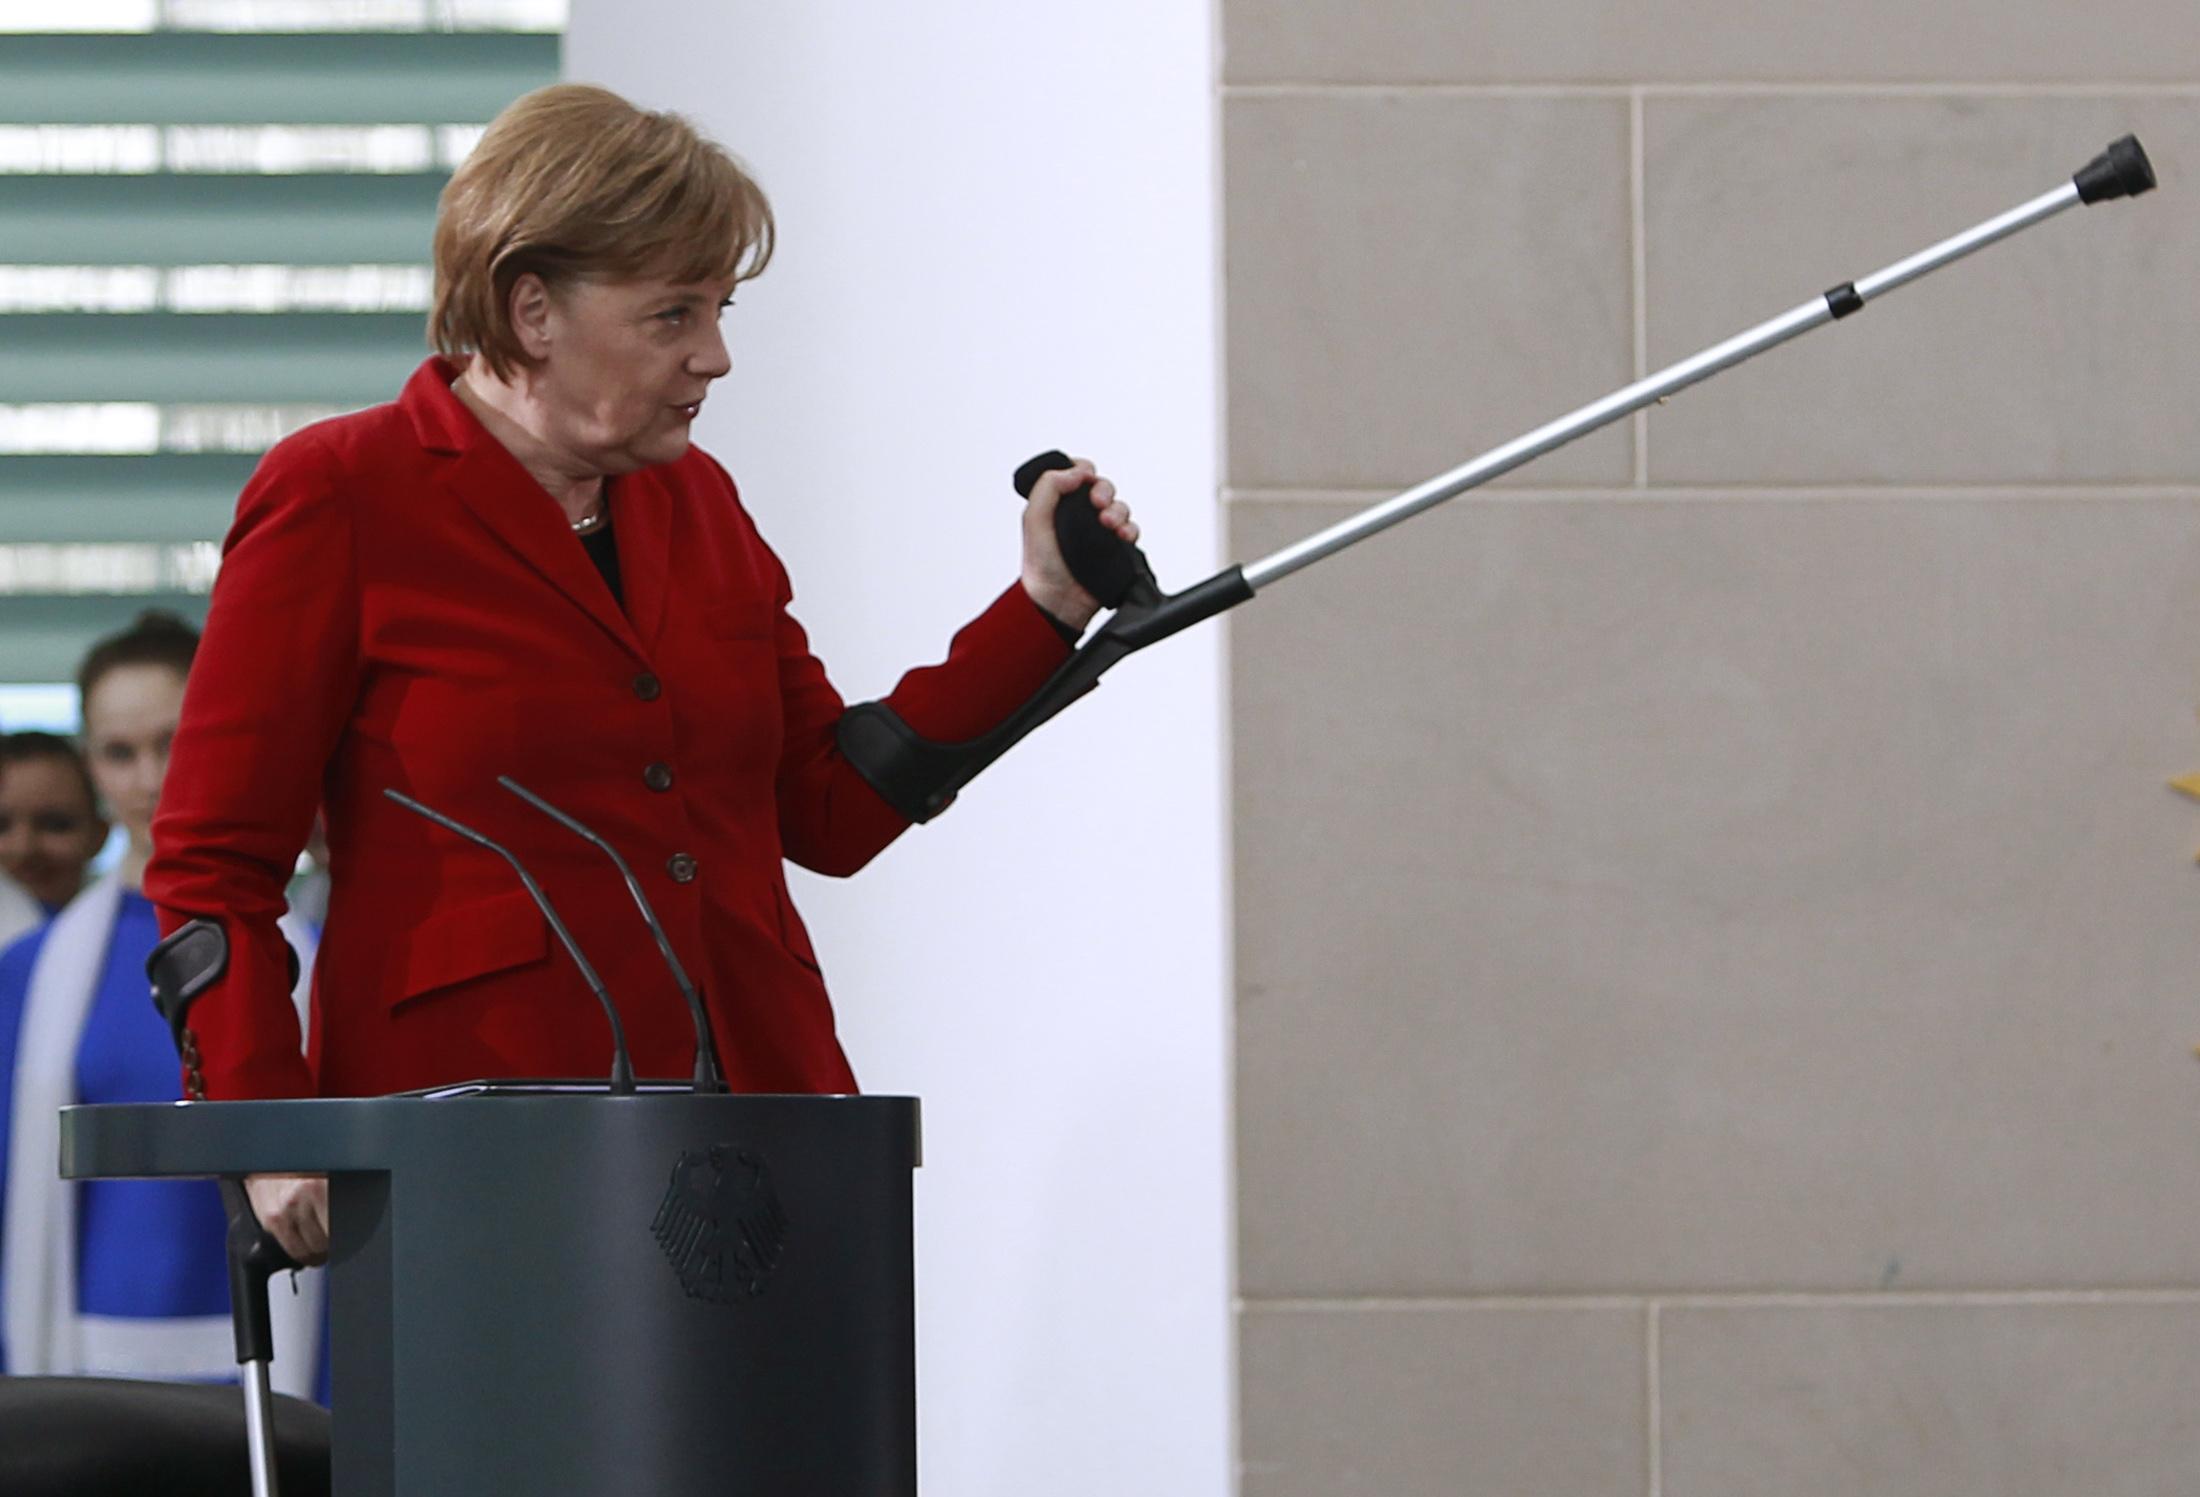 GERMANY-MERKEL/ACCIDENT